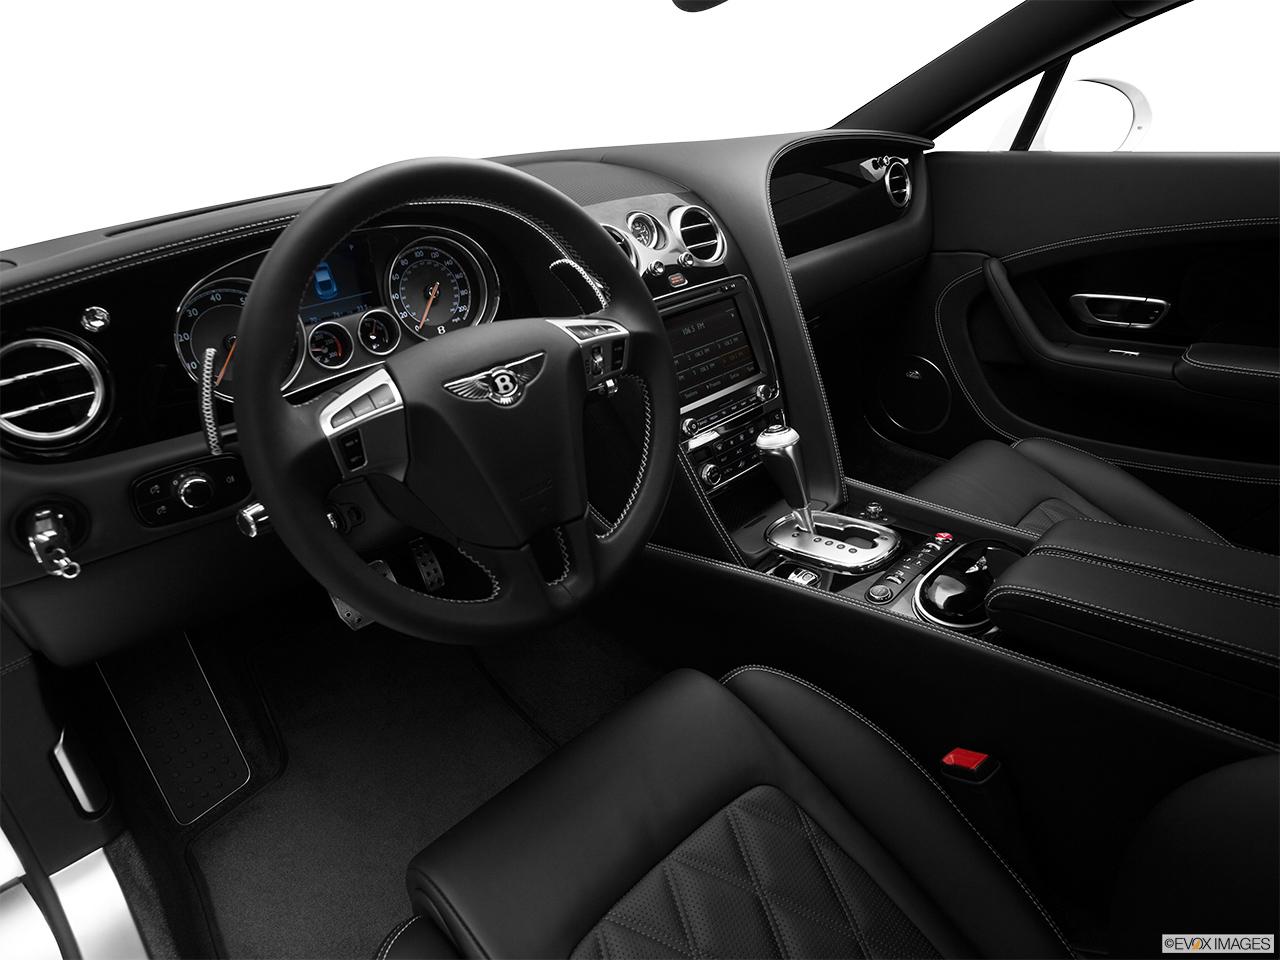 2014 Bentley Continental Gt V8 Coupe Interior Hero